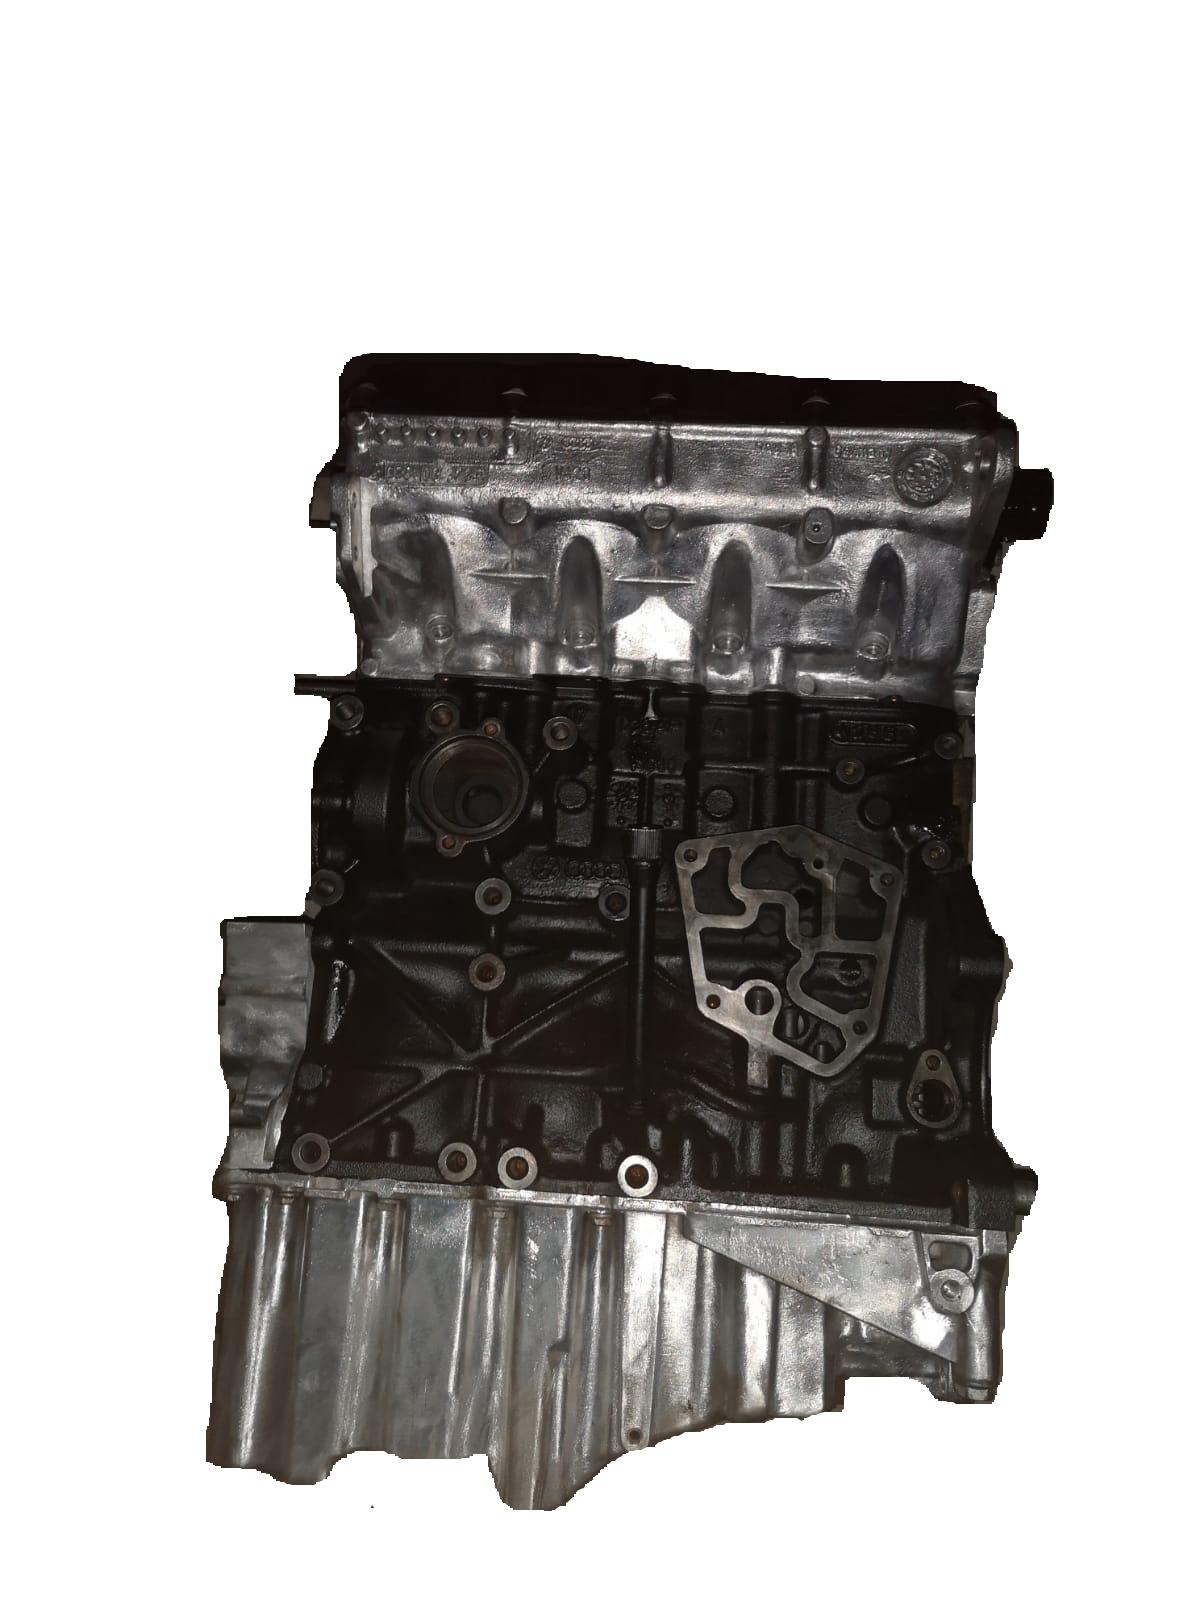 Motor 2006 Audi A4 B7 1,9 TDI Diesel BRB 116 PS Kopf geplant Dichtung NEU